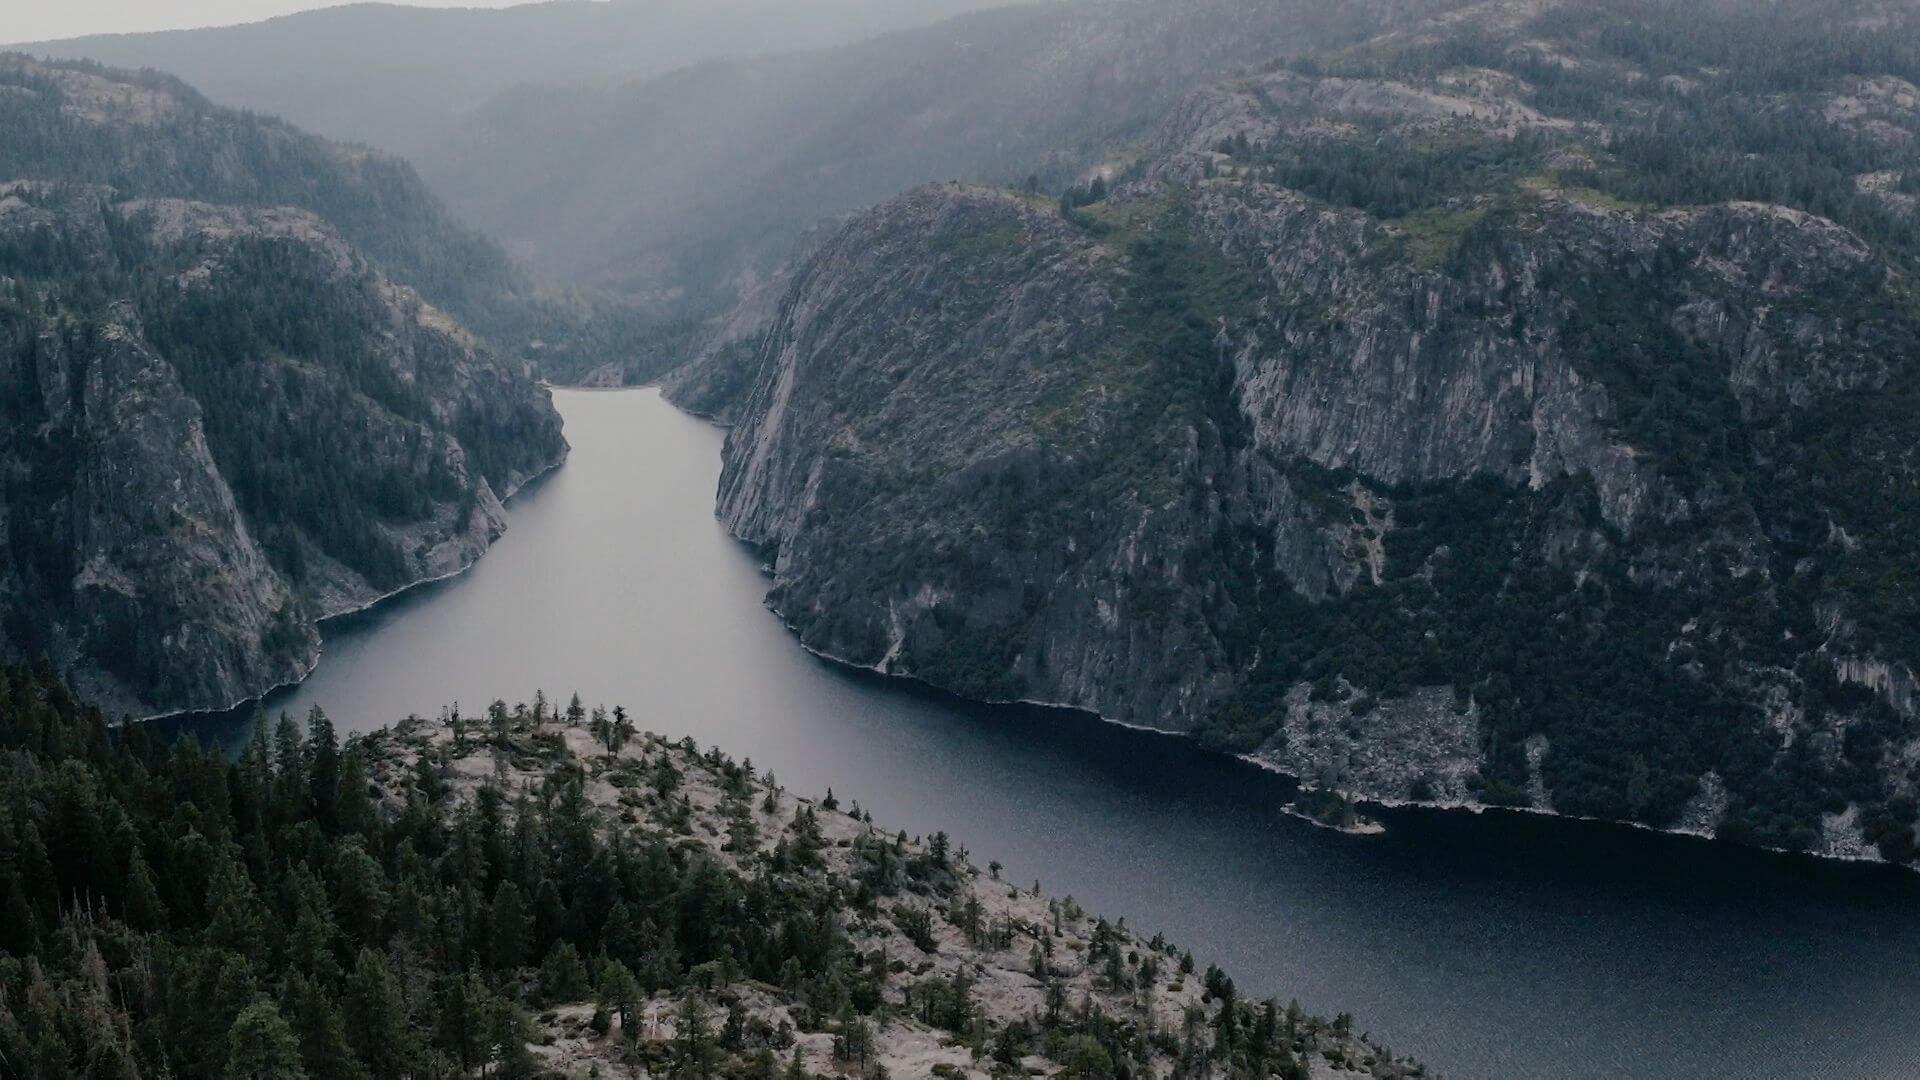 remote river in the wilderness